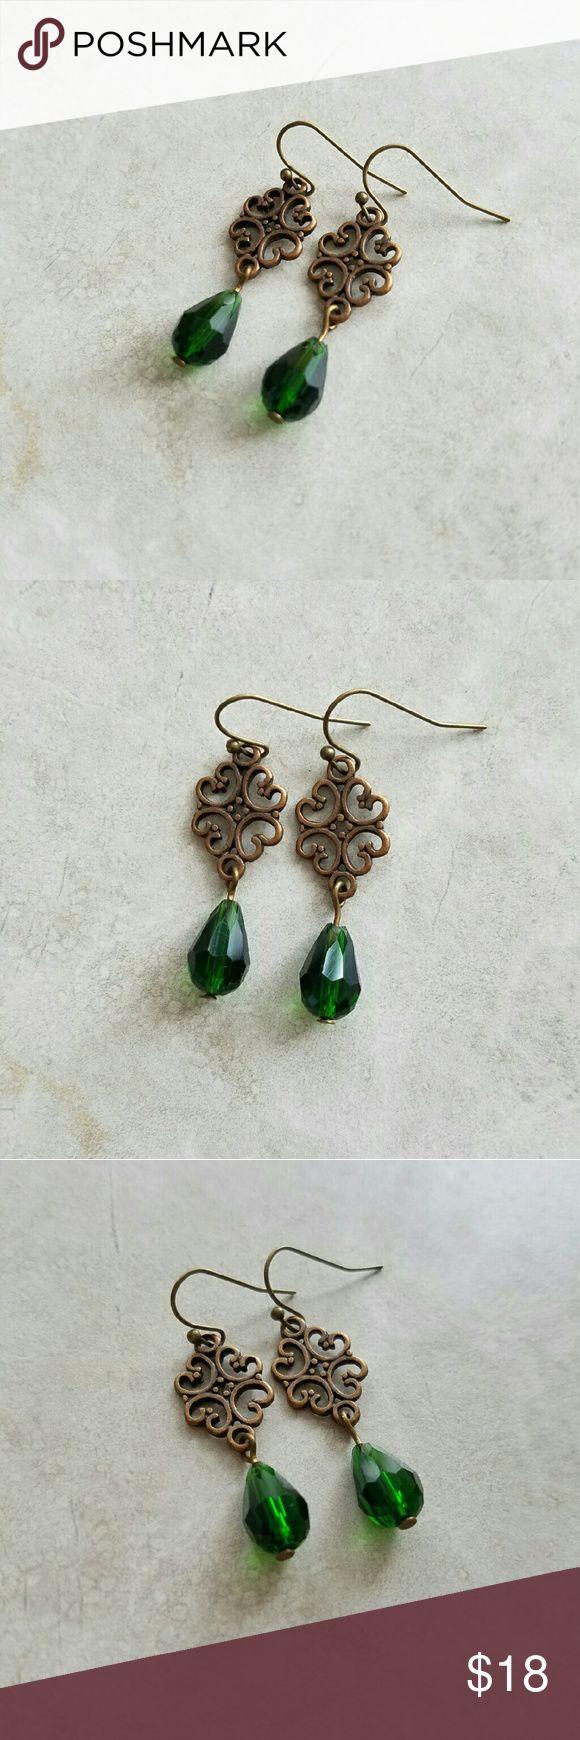 Emerald Green Earrings Lovely, classy earrings.  Green glass teardrops hang from antiqued copper filigree charms.  Brand new, never been worn. Anthropologie Jewelry Earrings